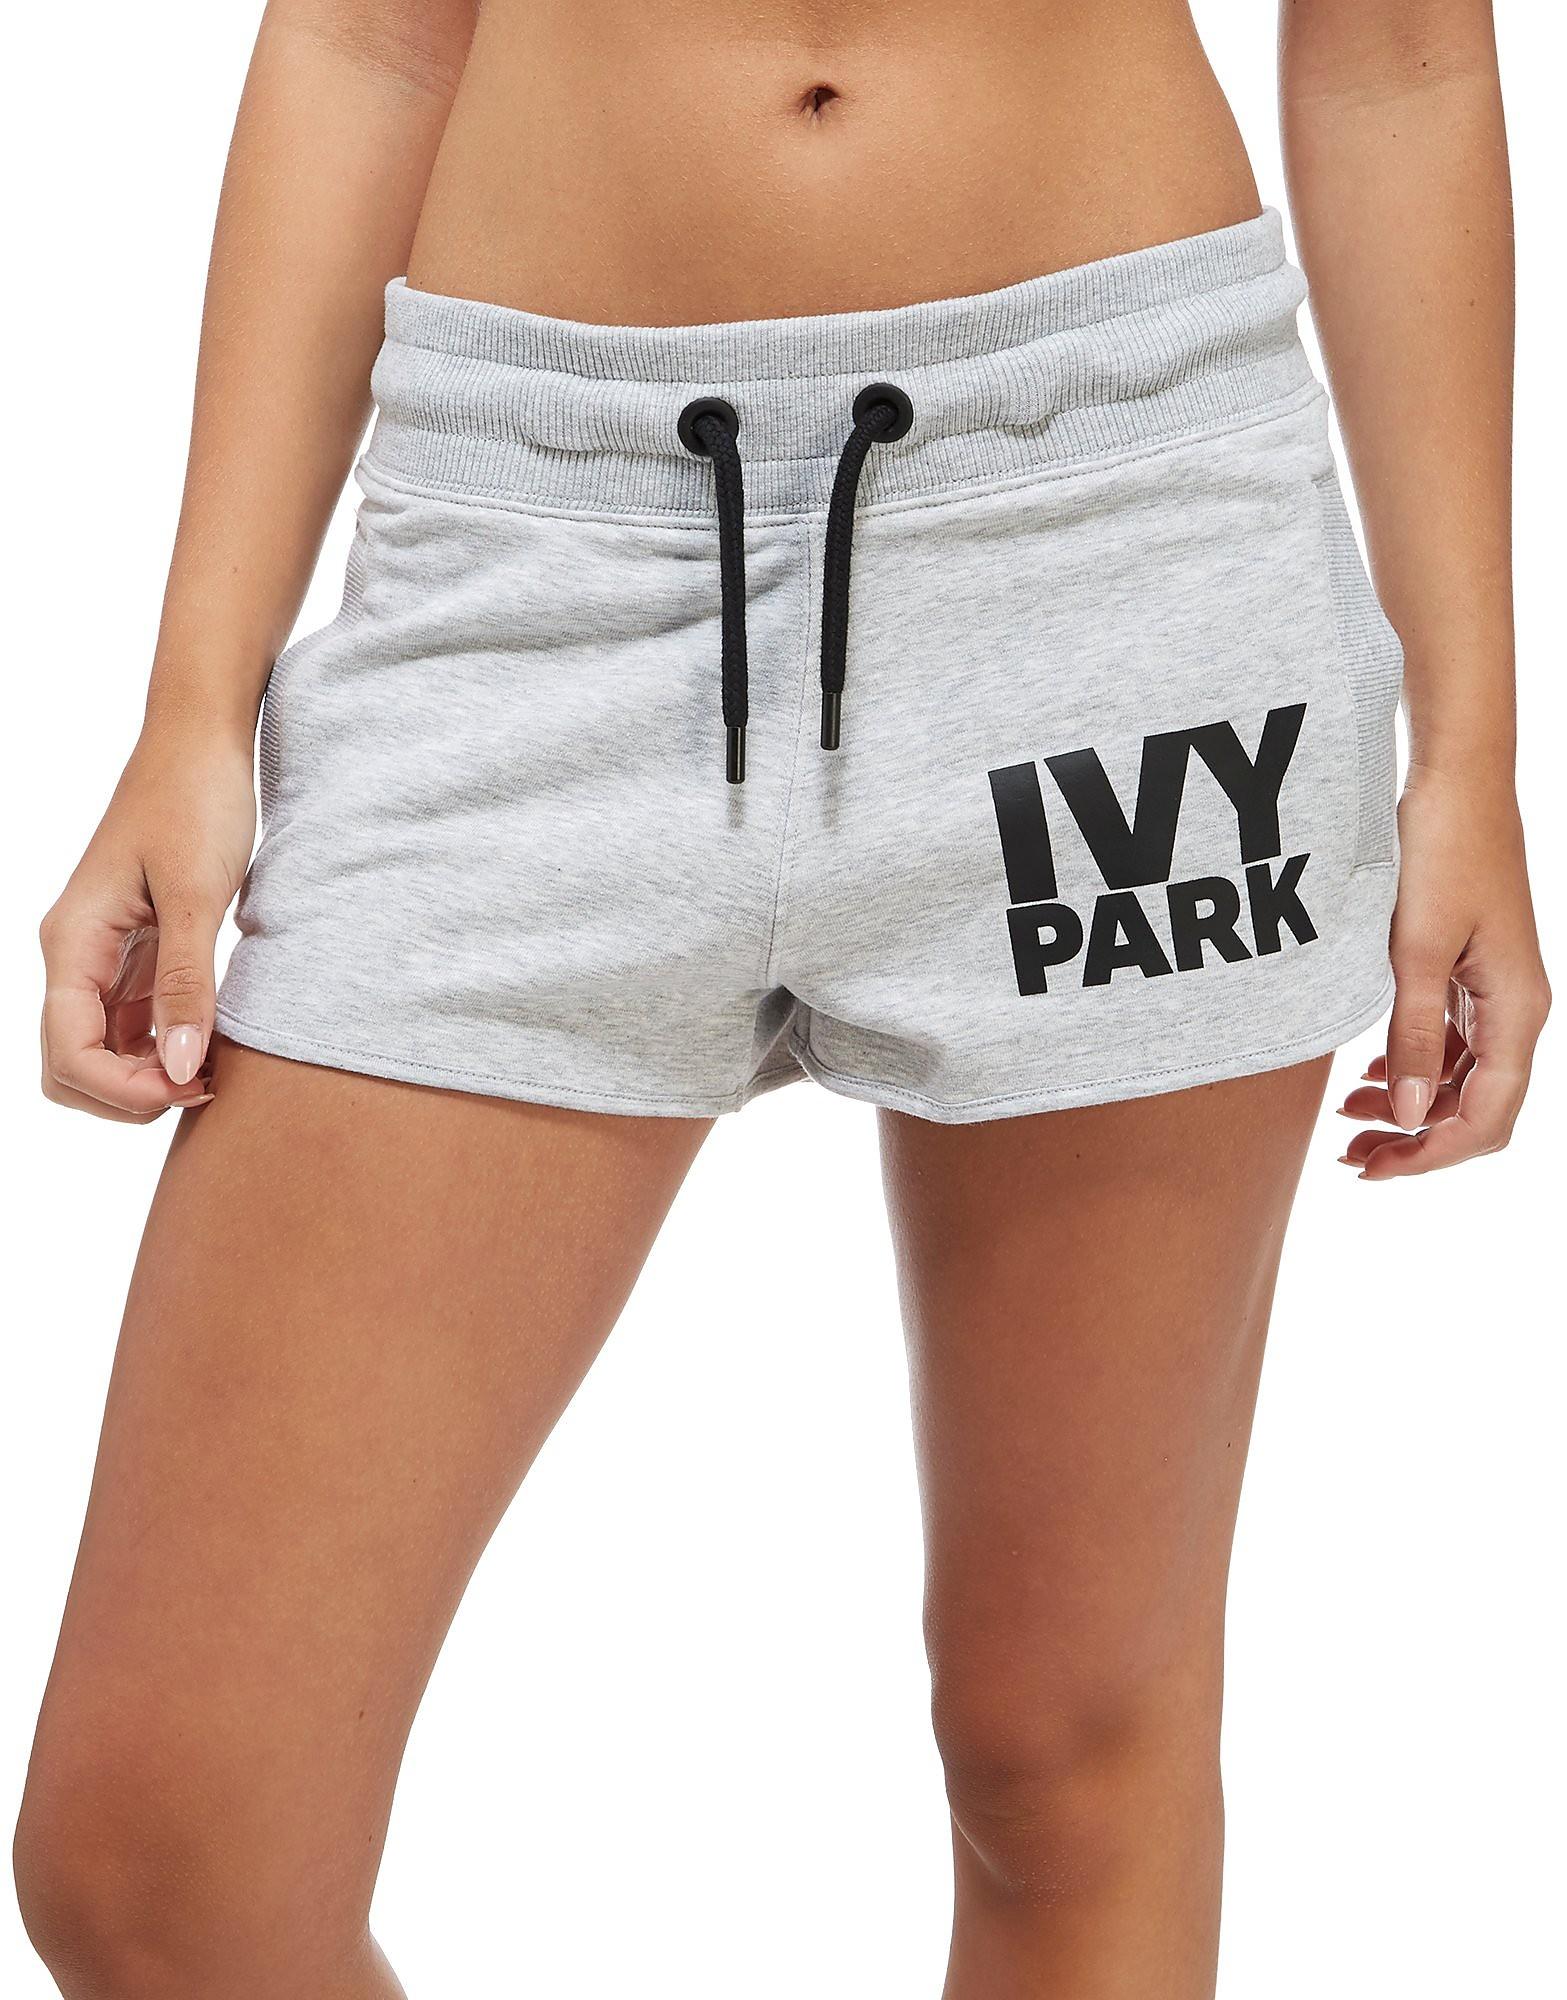 IVY PARK Shorts